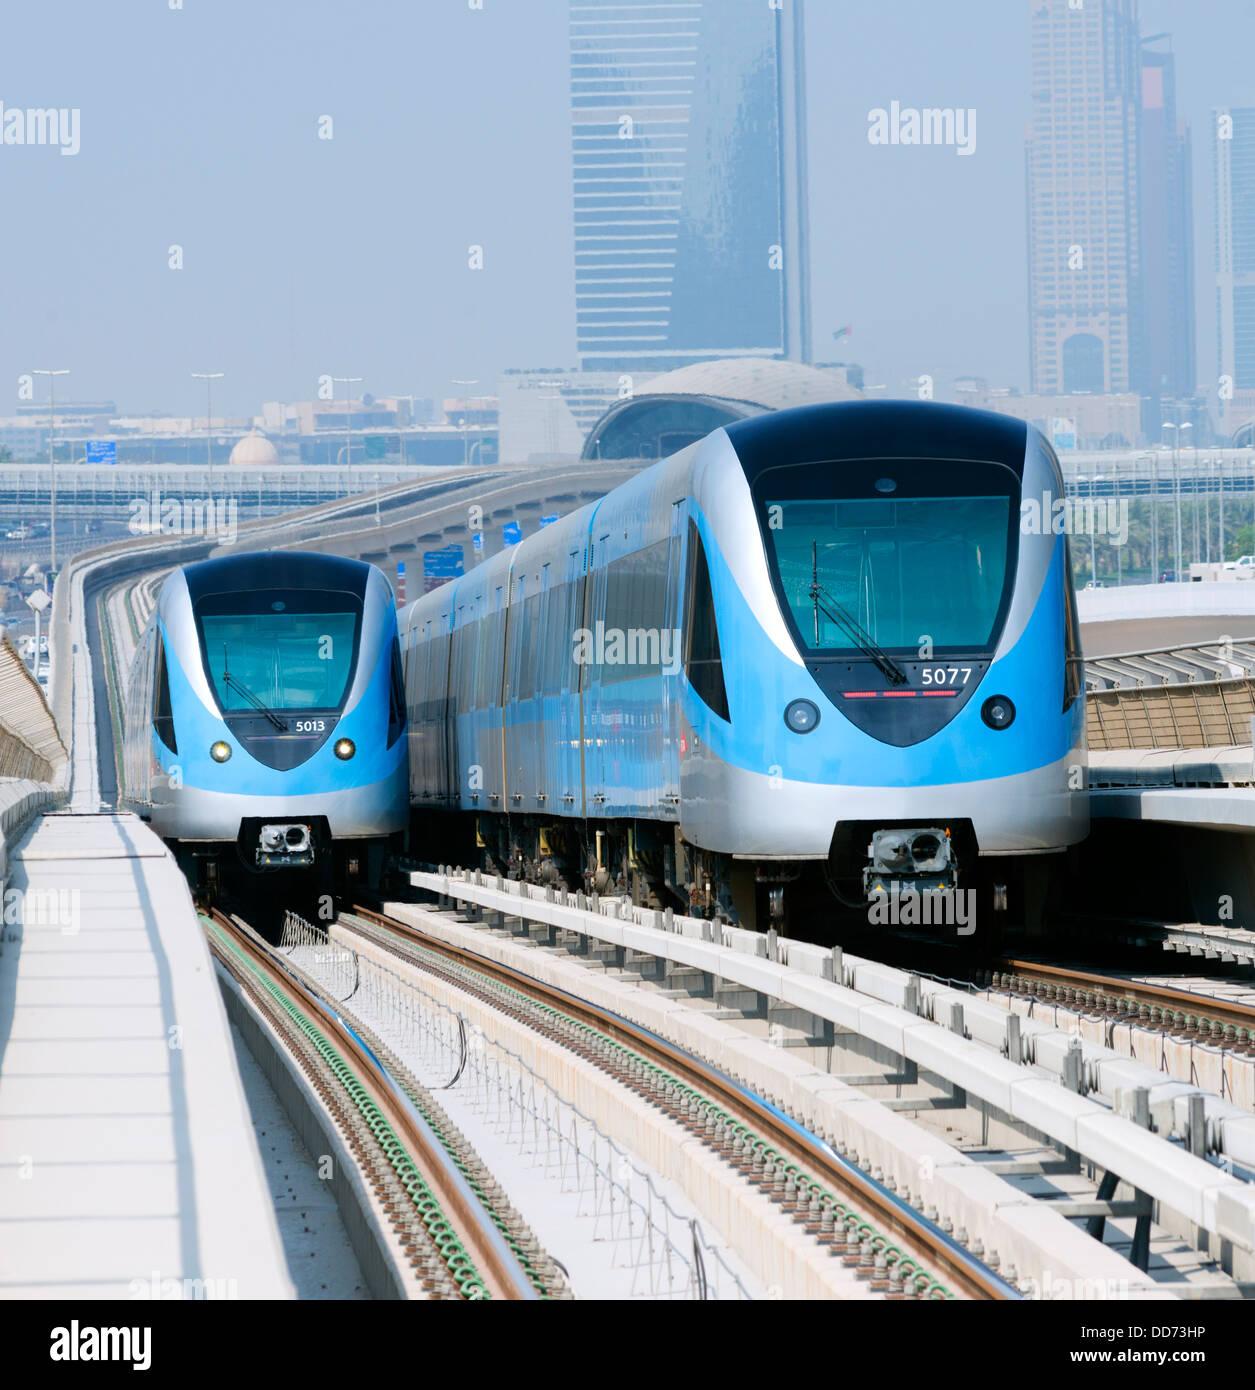 View of Metro railway  trains in Dubai United Arab Emirates - Stock Image